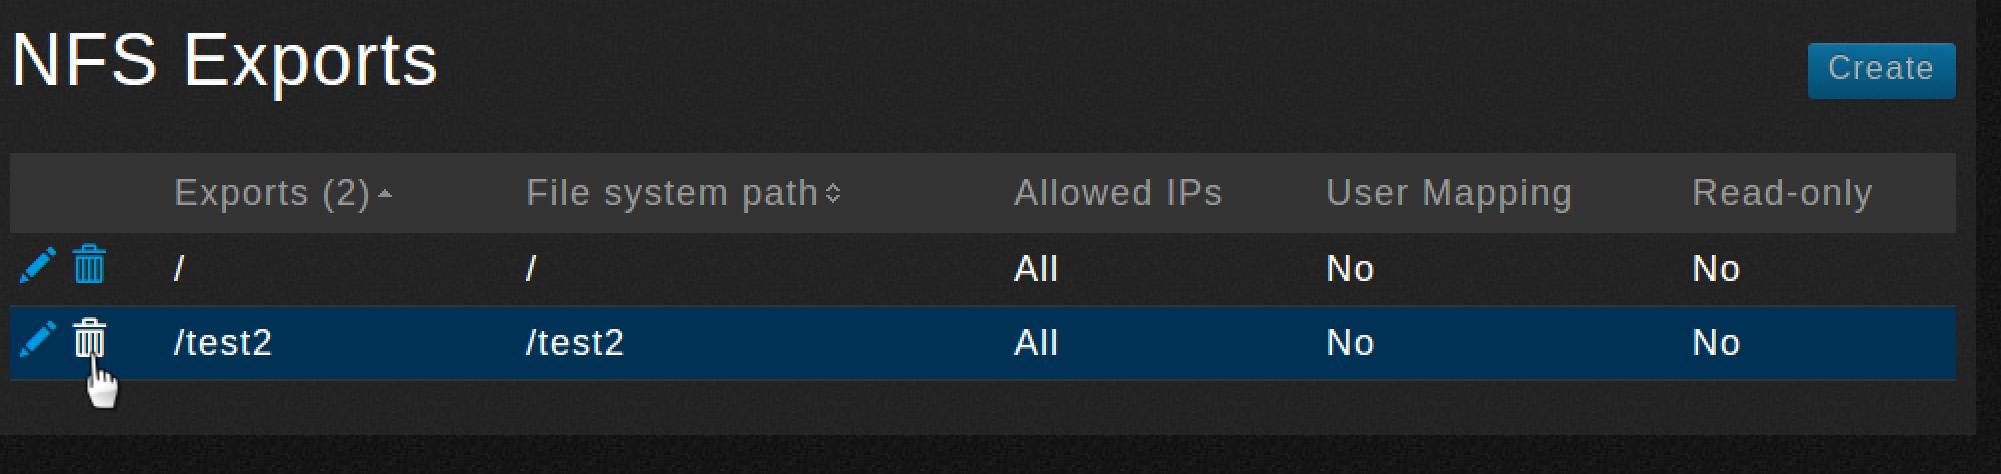 NFS Exports-delete